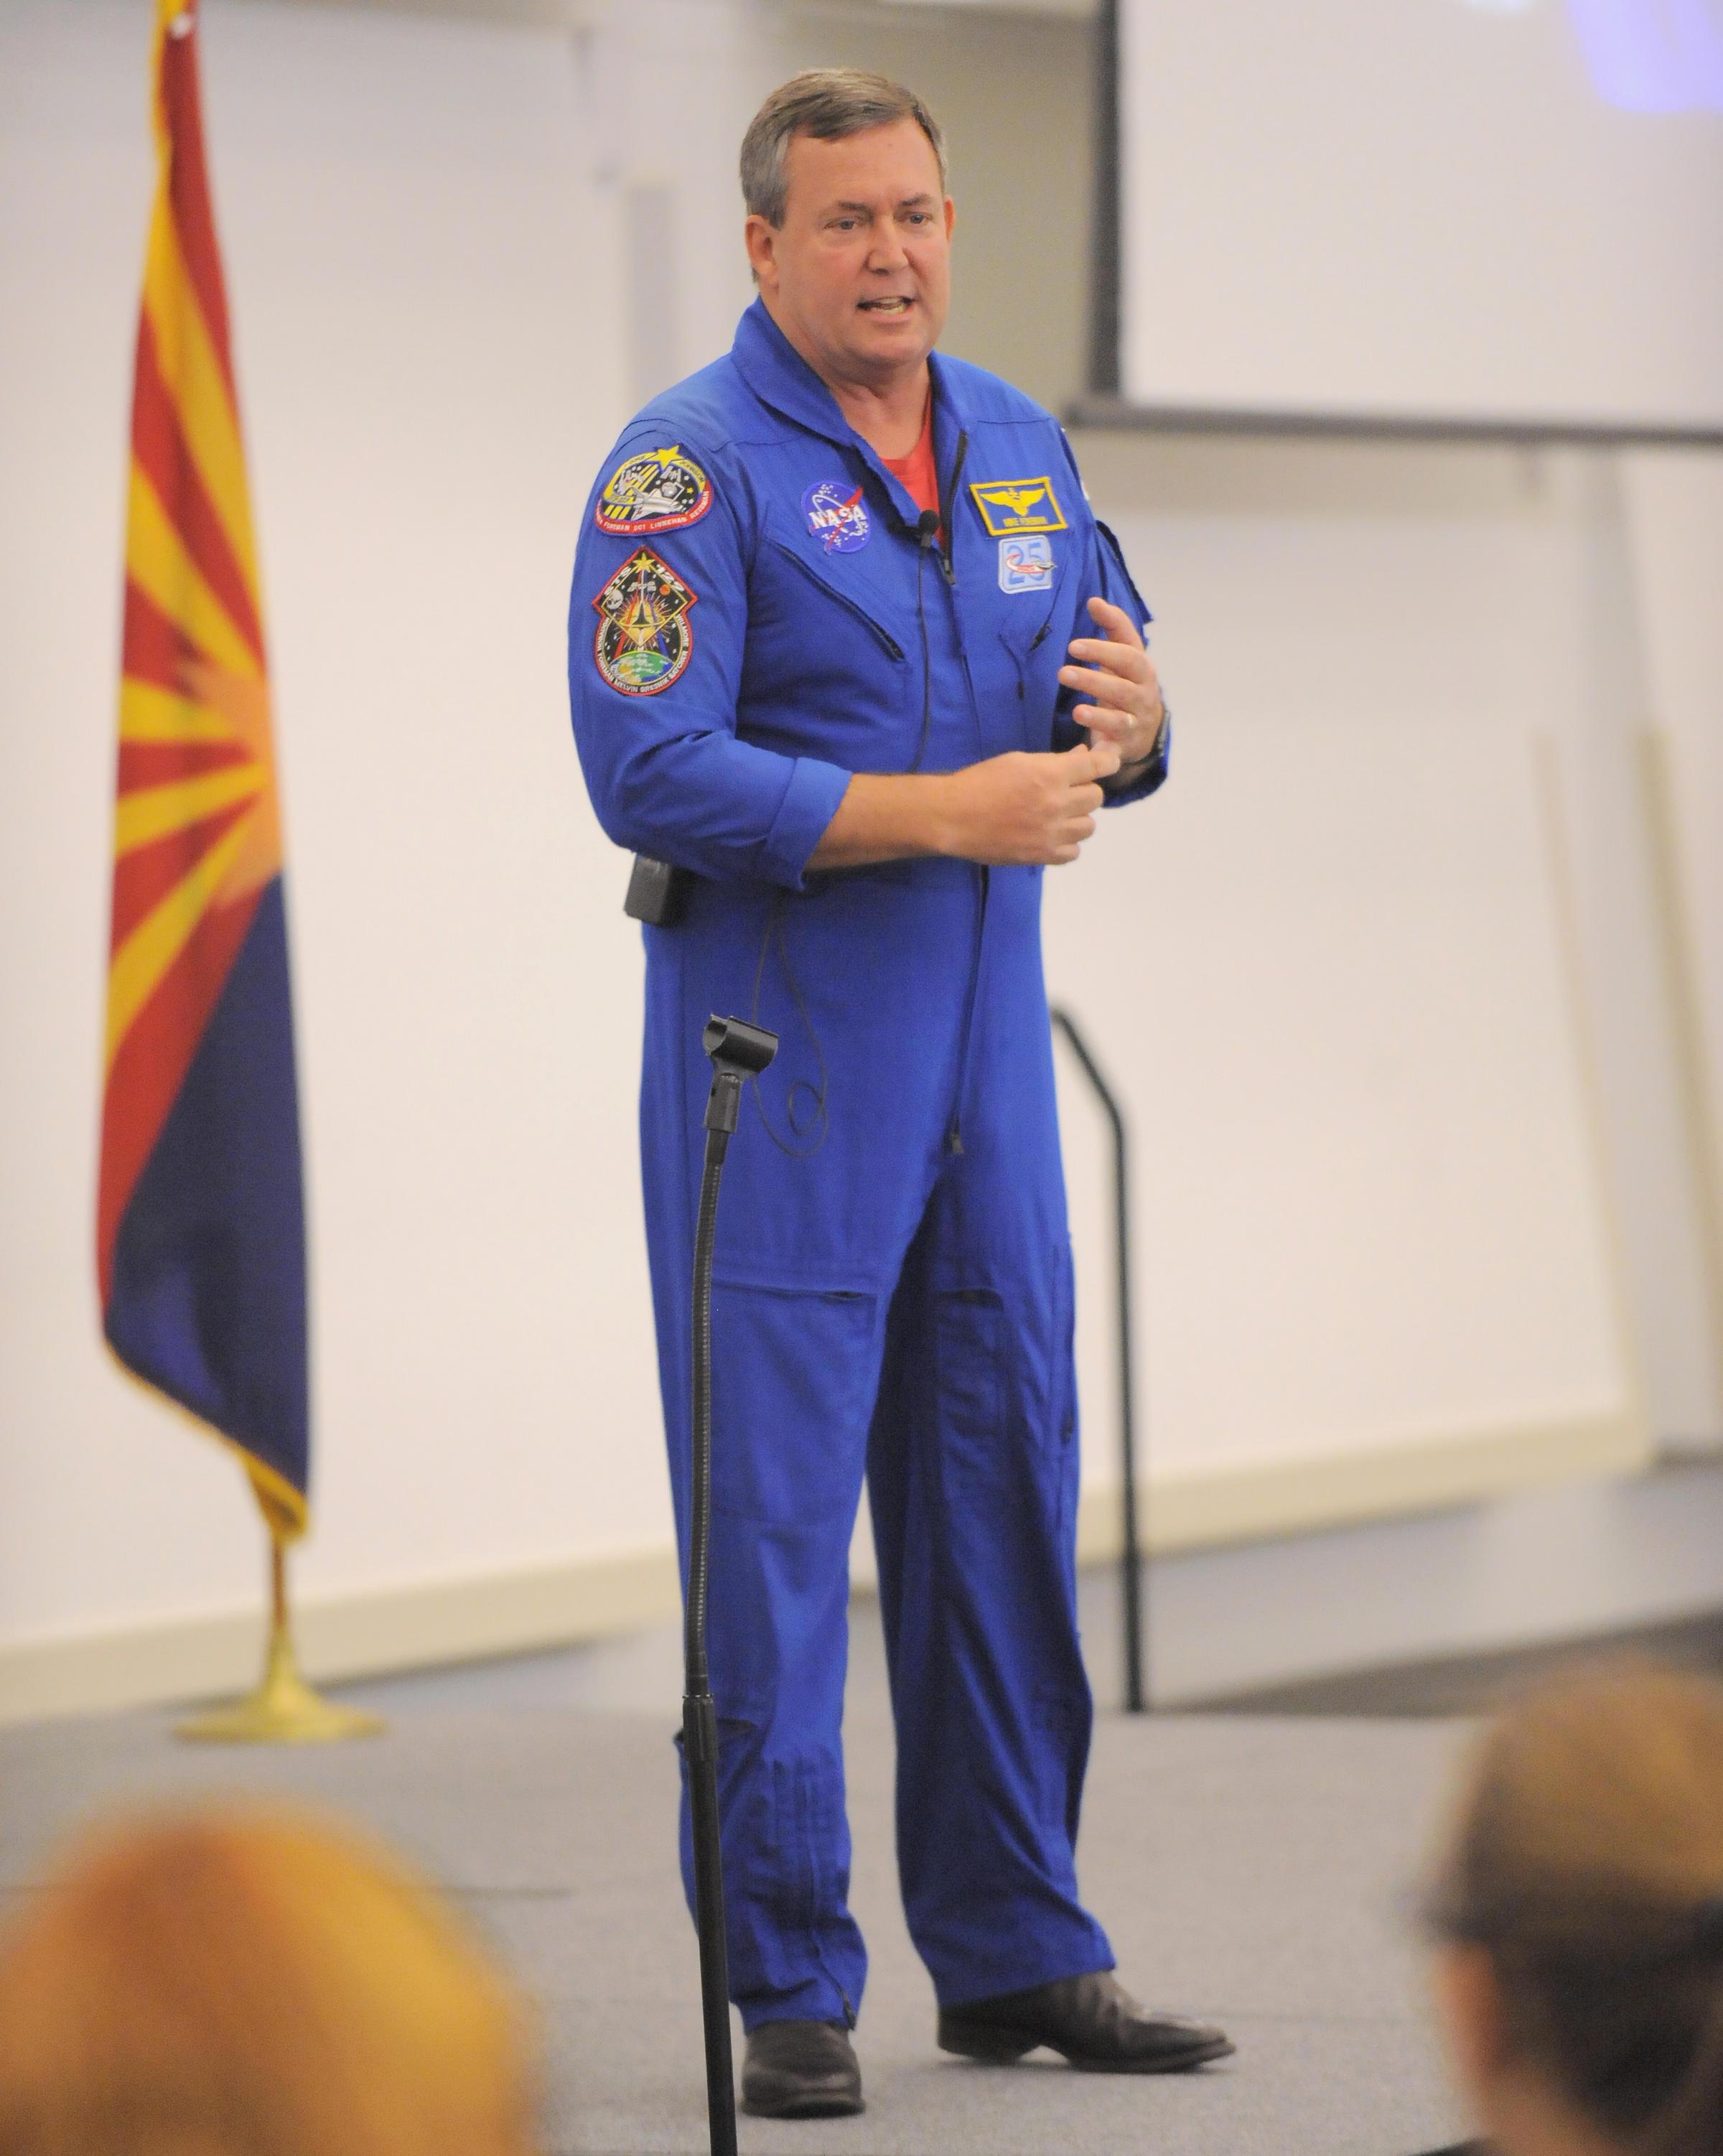 michael foreman astronaut - photo #6